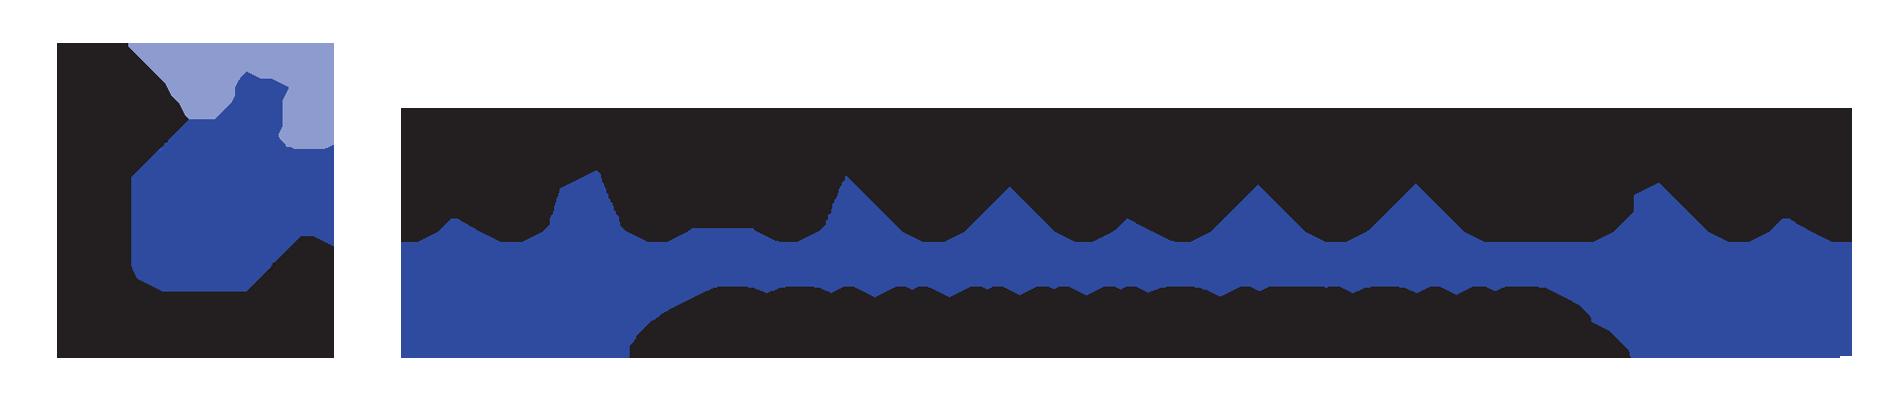 Rainier Communications | Technology Public Relations